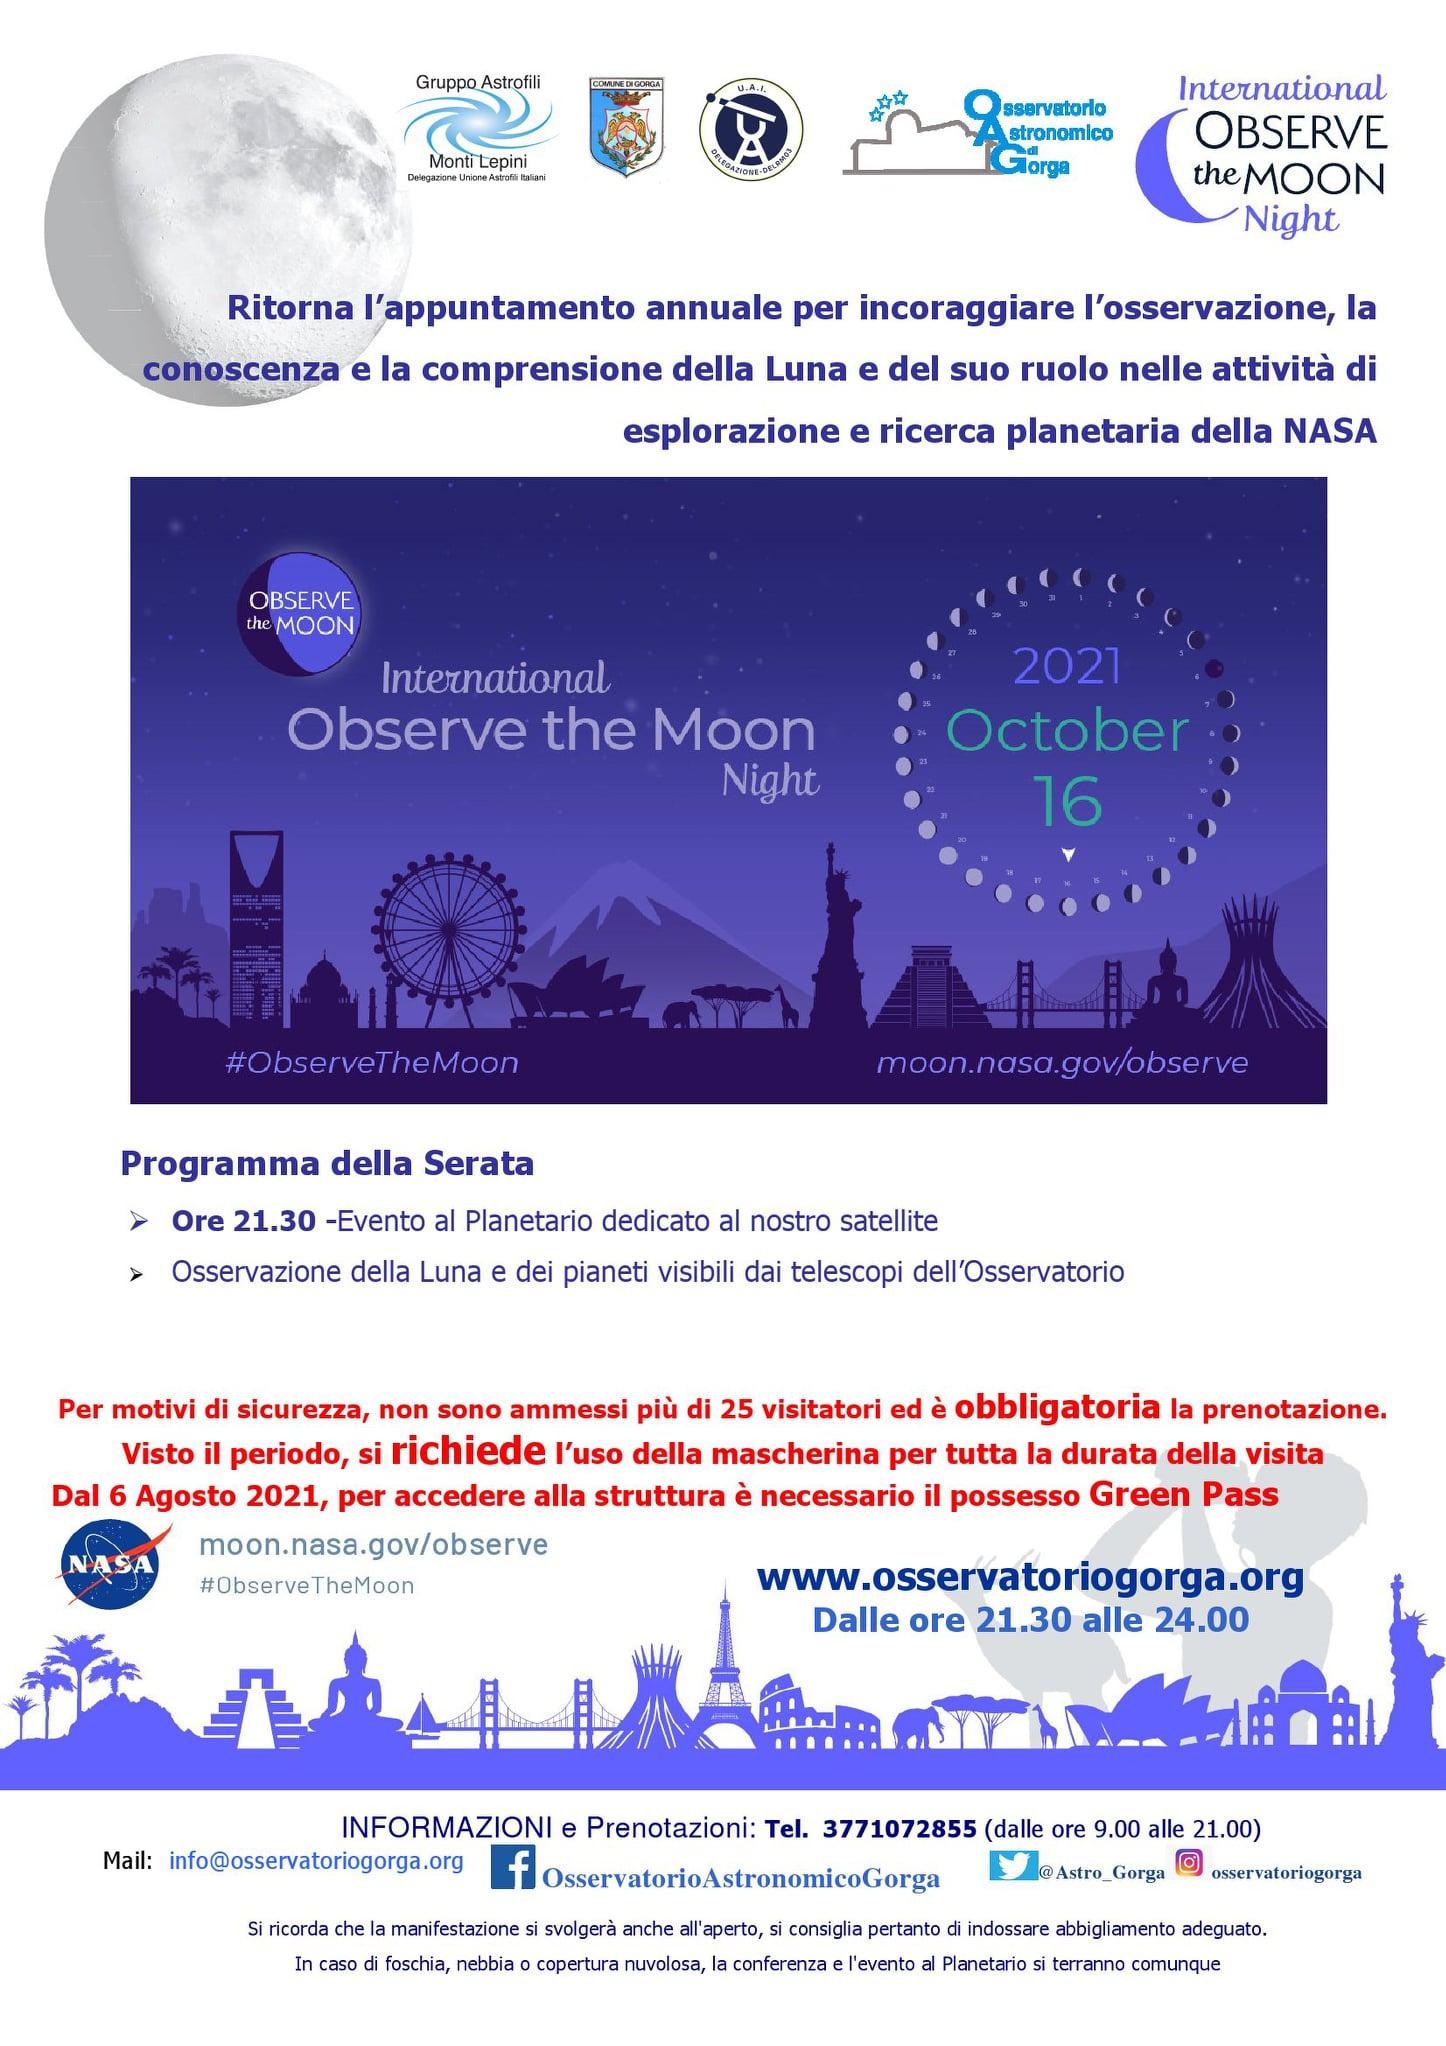 Gorga: International Observe the Moon Night @ Osservatorio Astronomico di Gorga